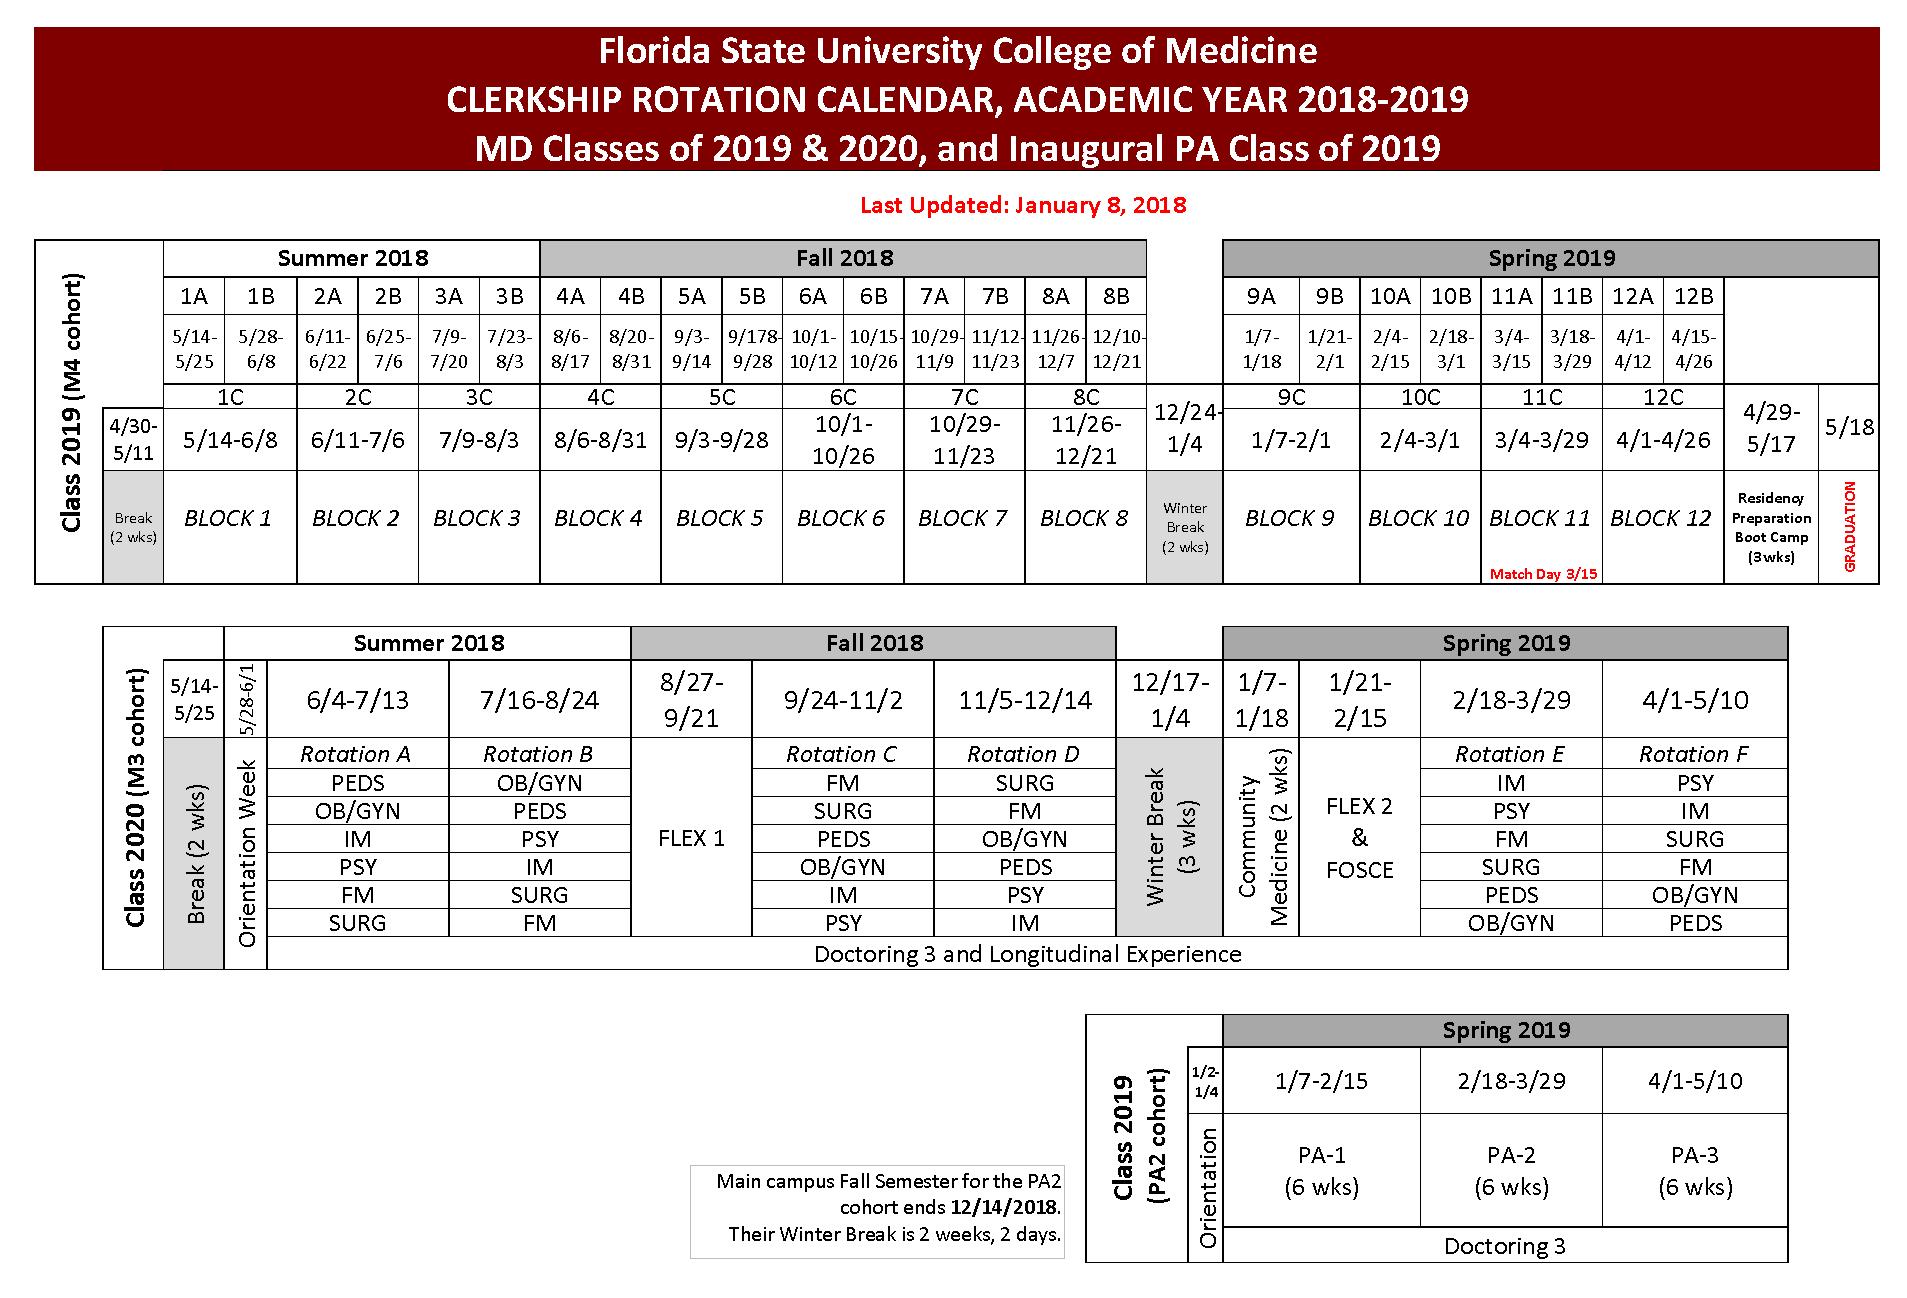 Fsu Calendar 2019 Academic Calendar for 2018 2019 | College of Medicine